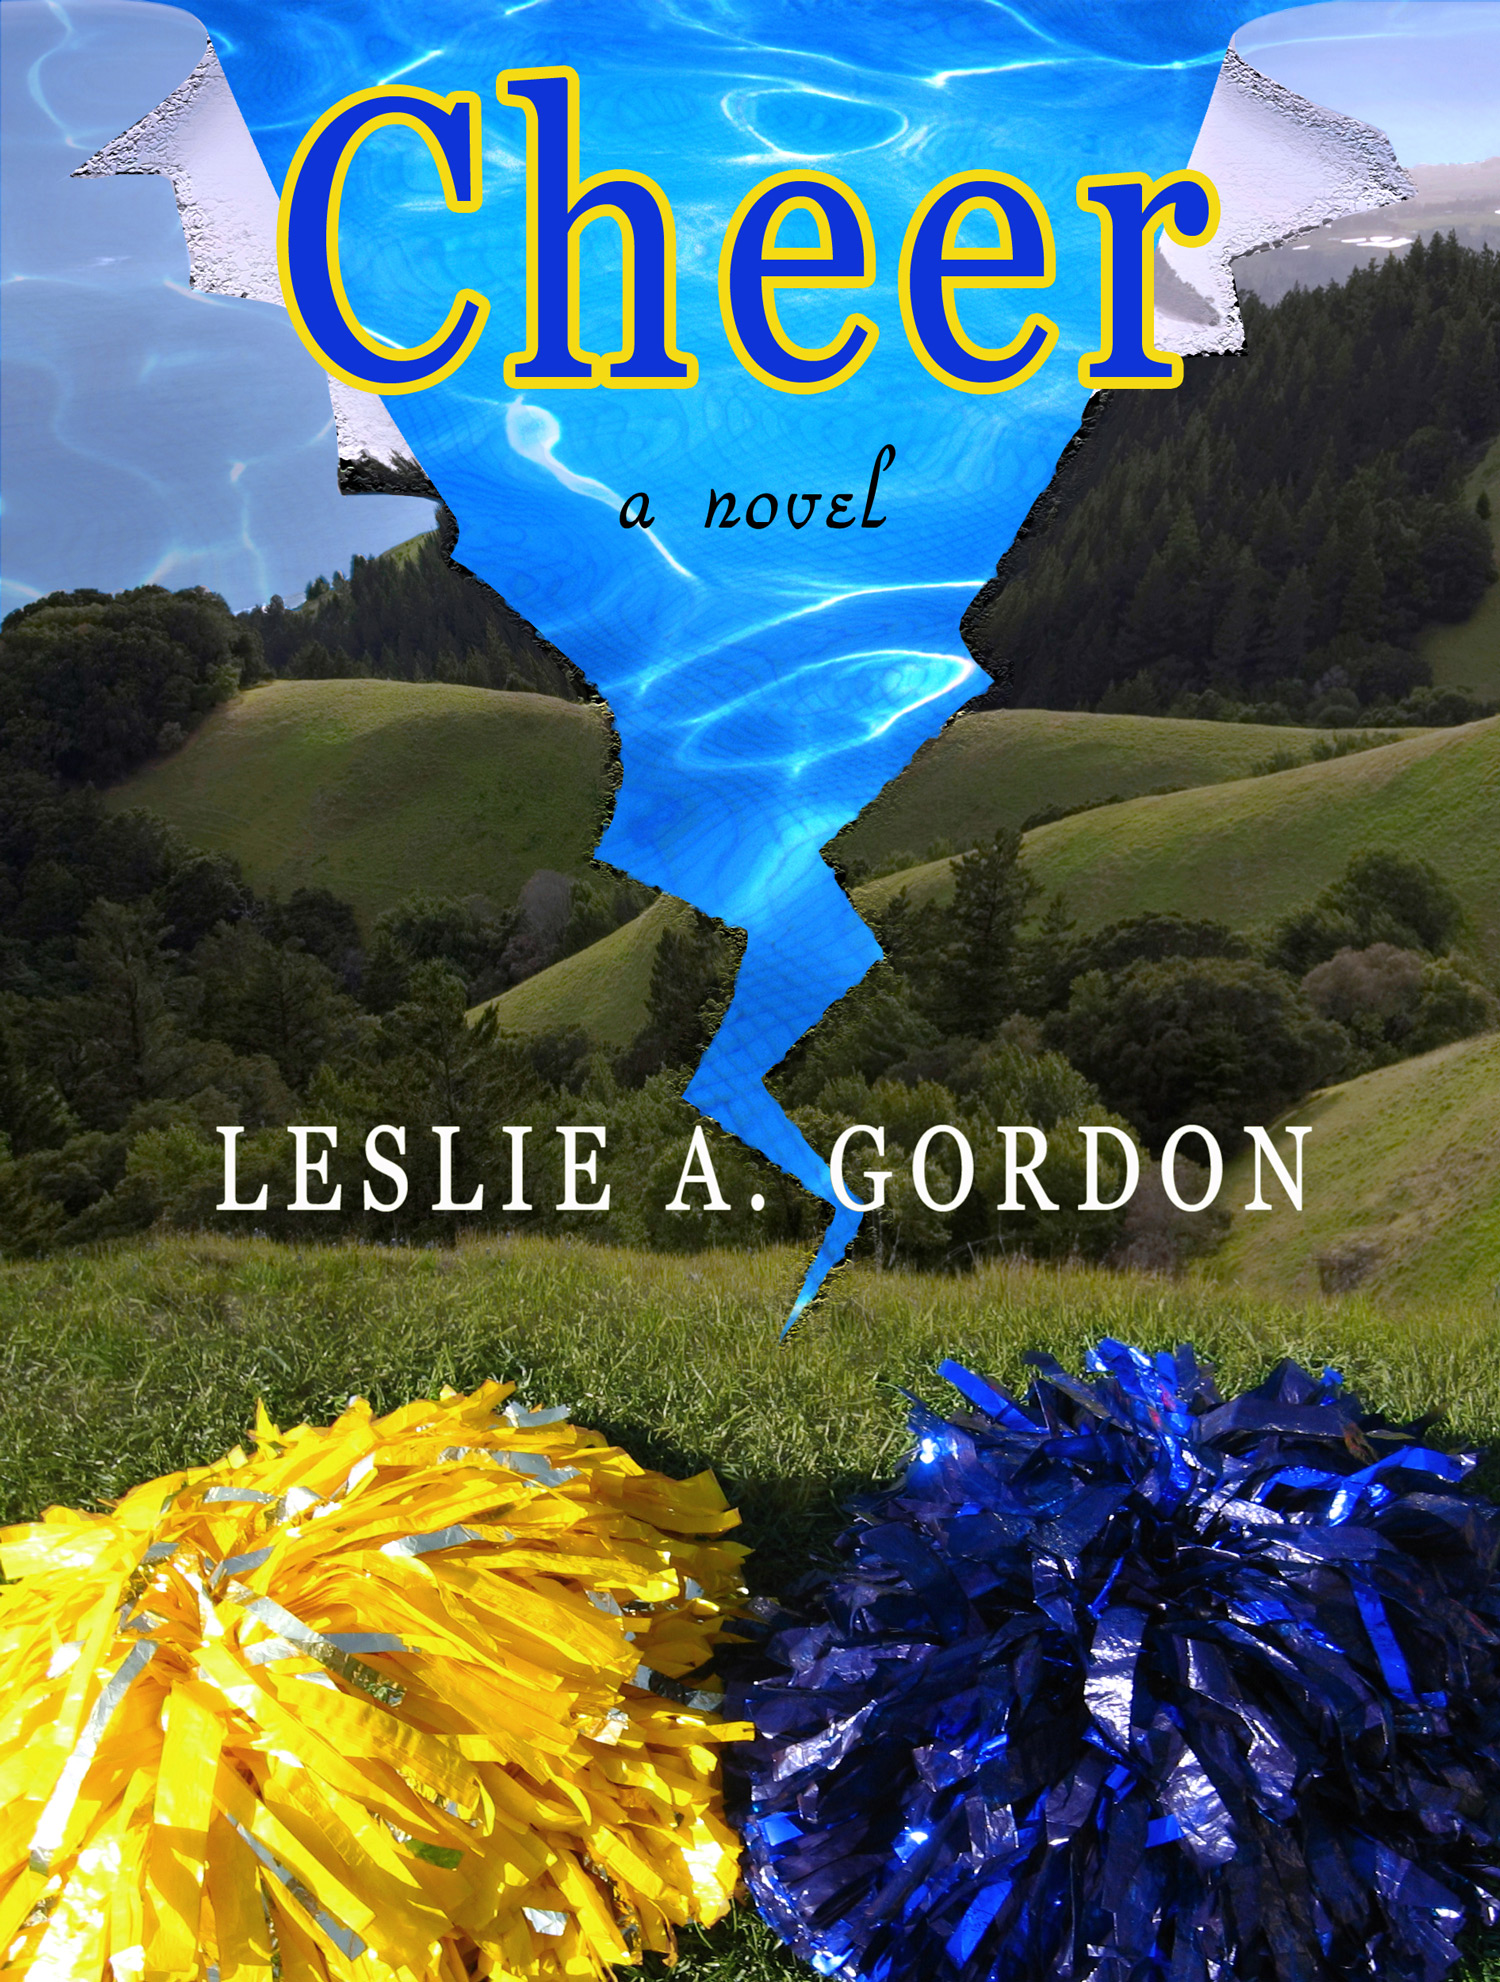 Cheer-Cover-2.jpg